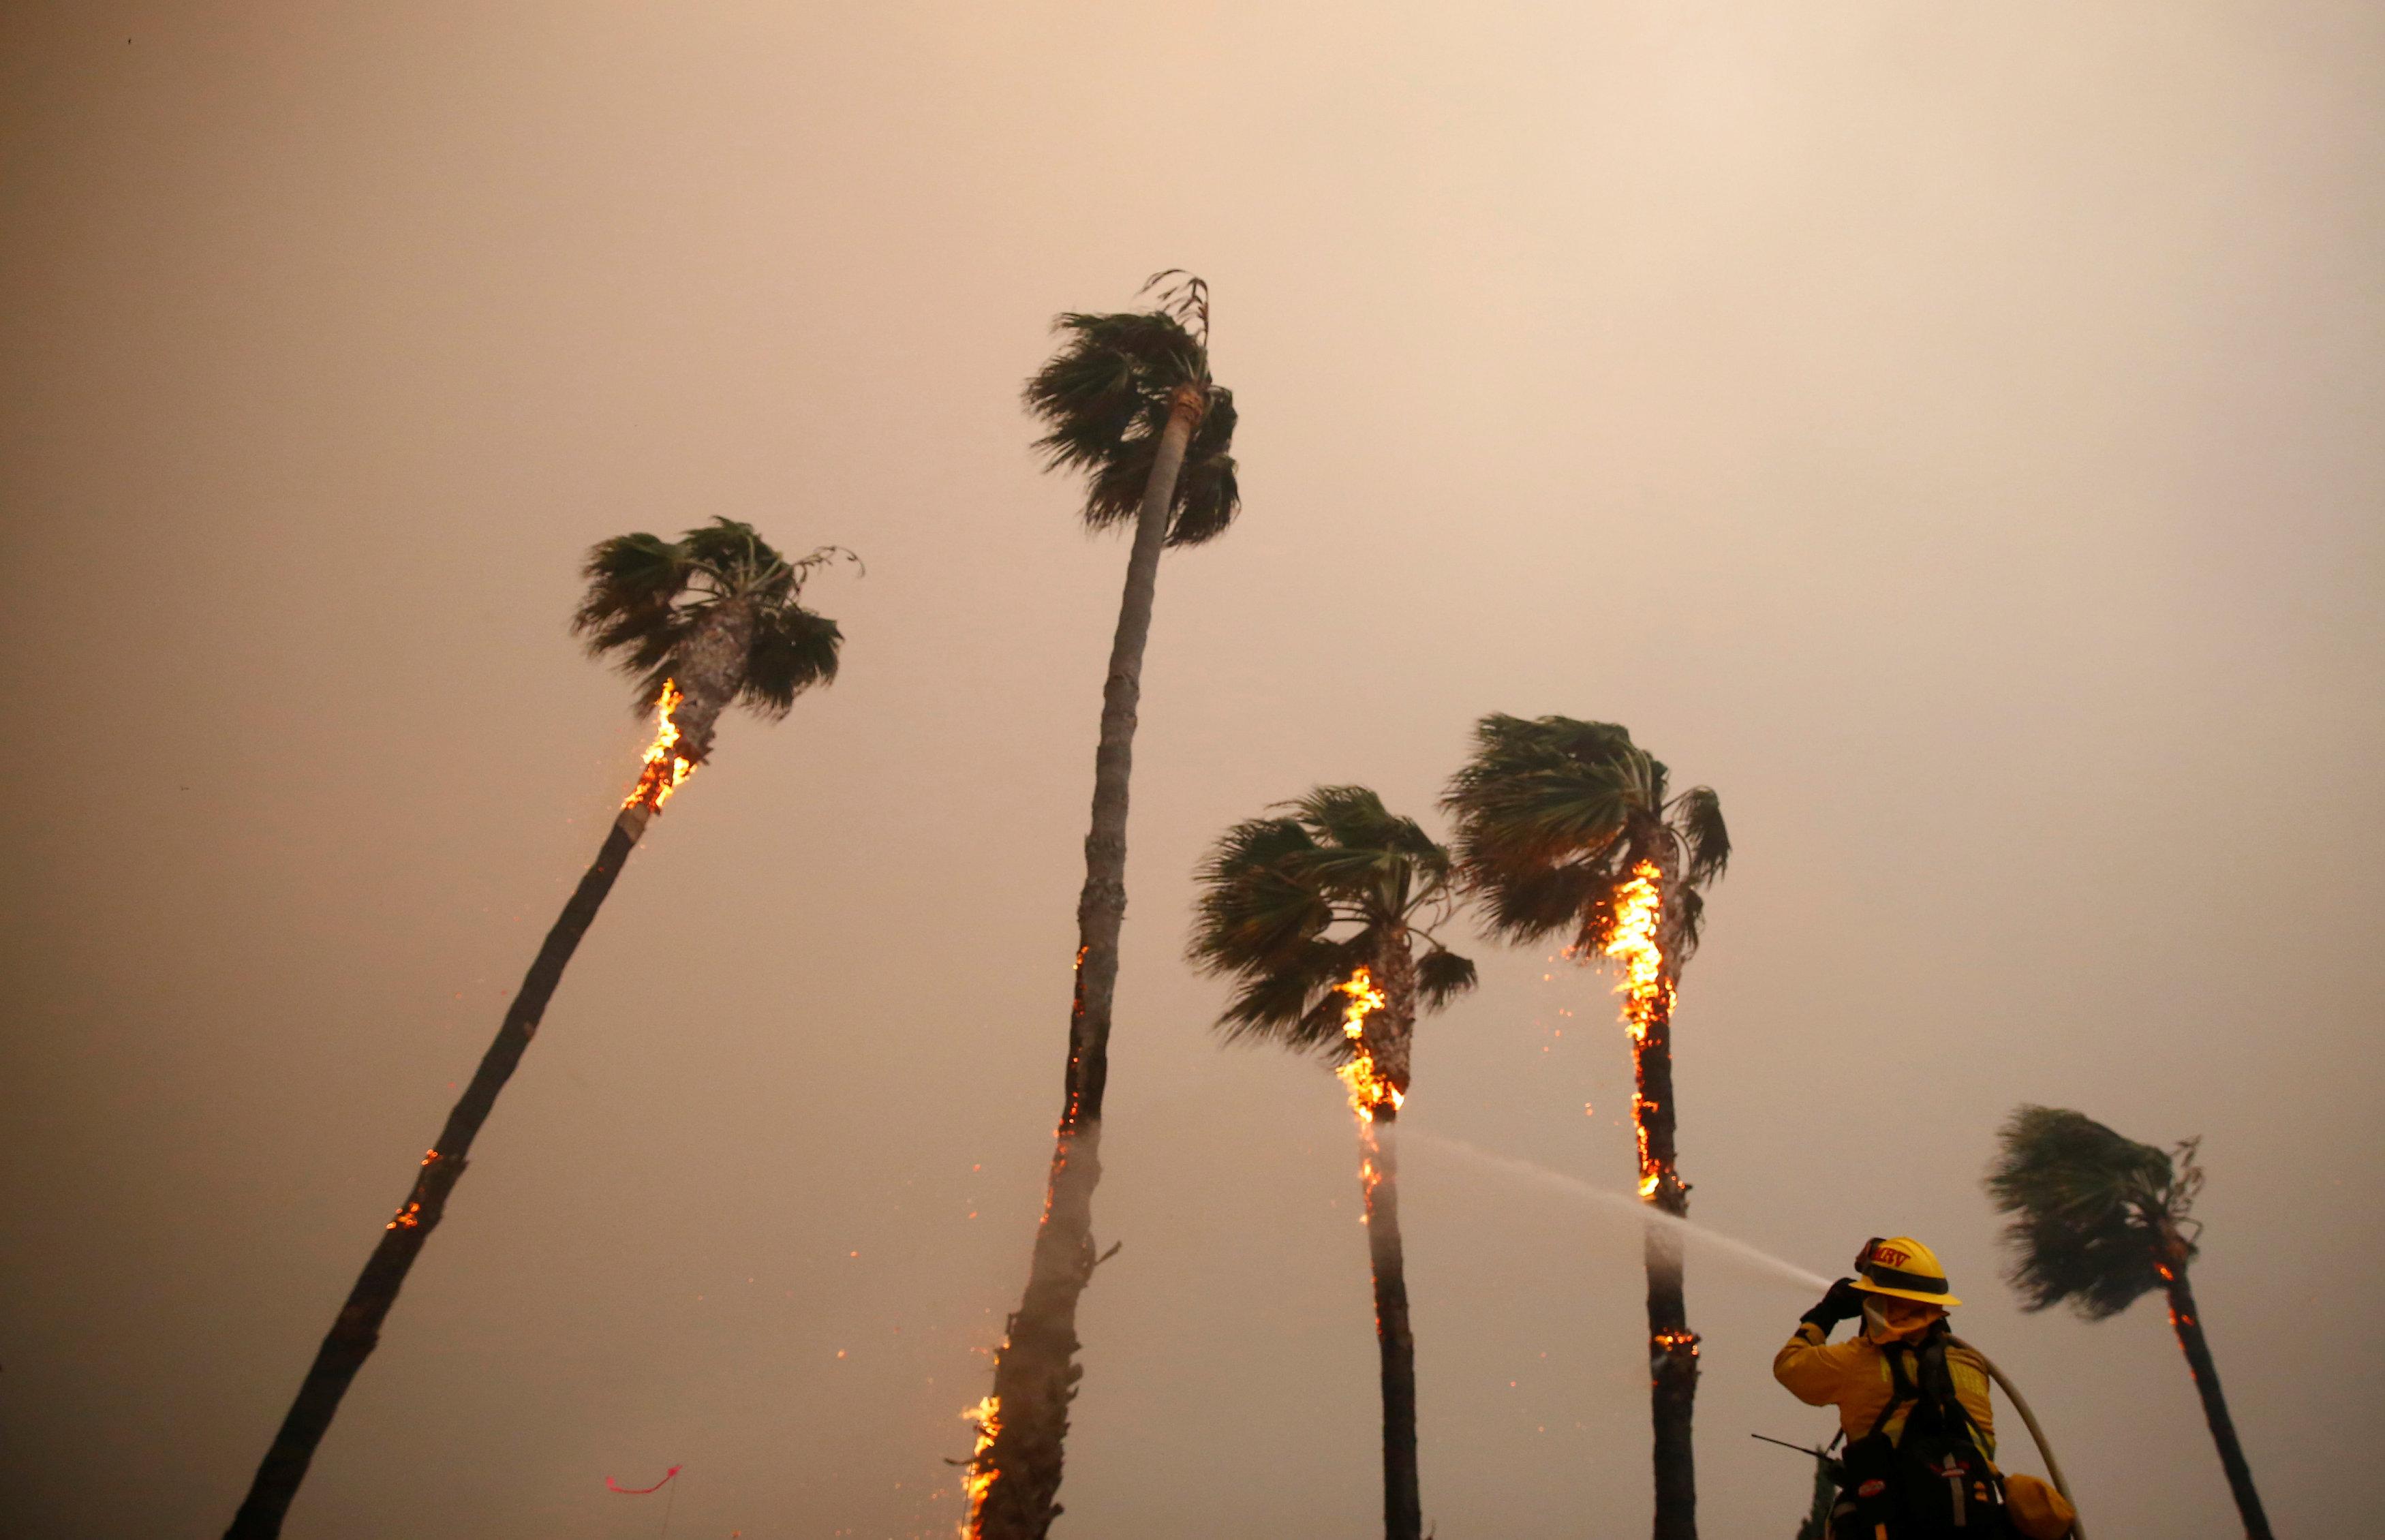 Incendios en Malibú. (REUTERS/Eric Thayer)